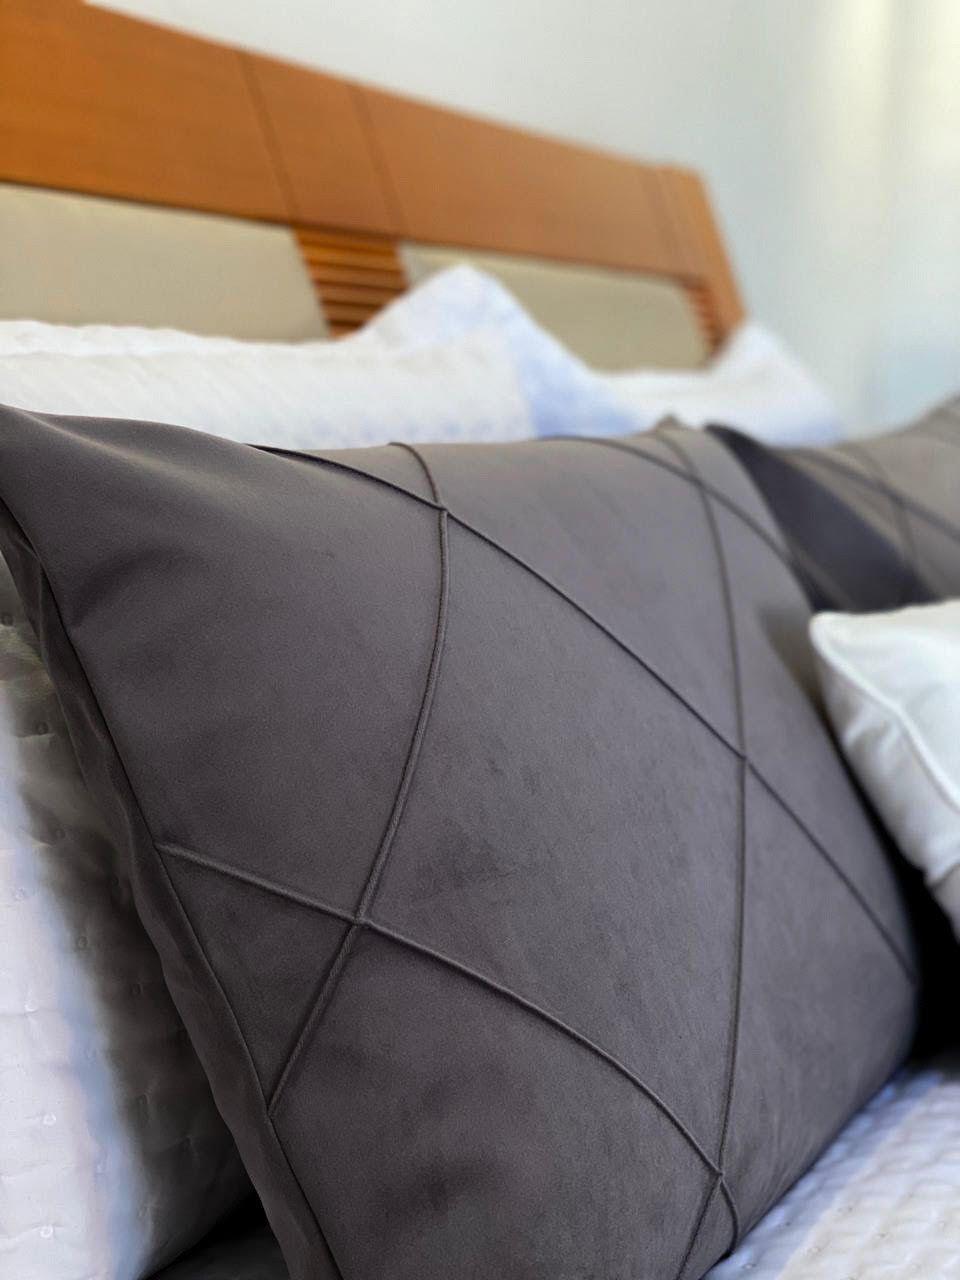 Kit 2 Porta Travesseiros Veludo Cinza Escuro c/ Costura